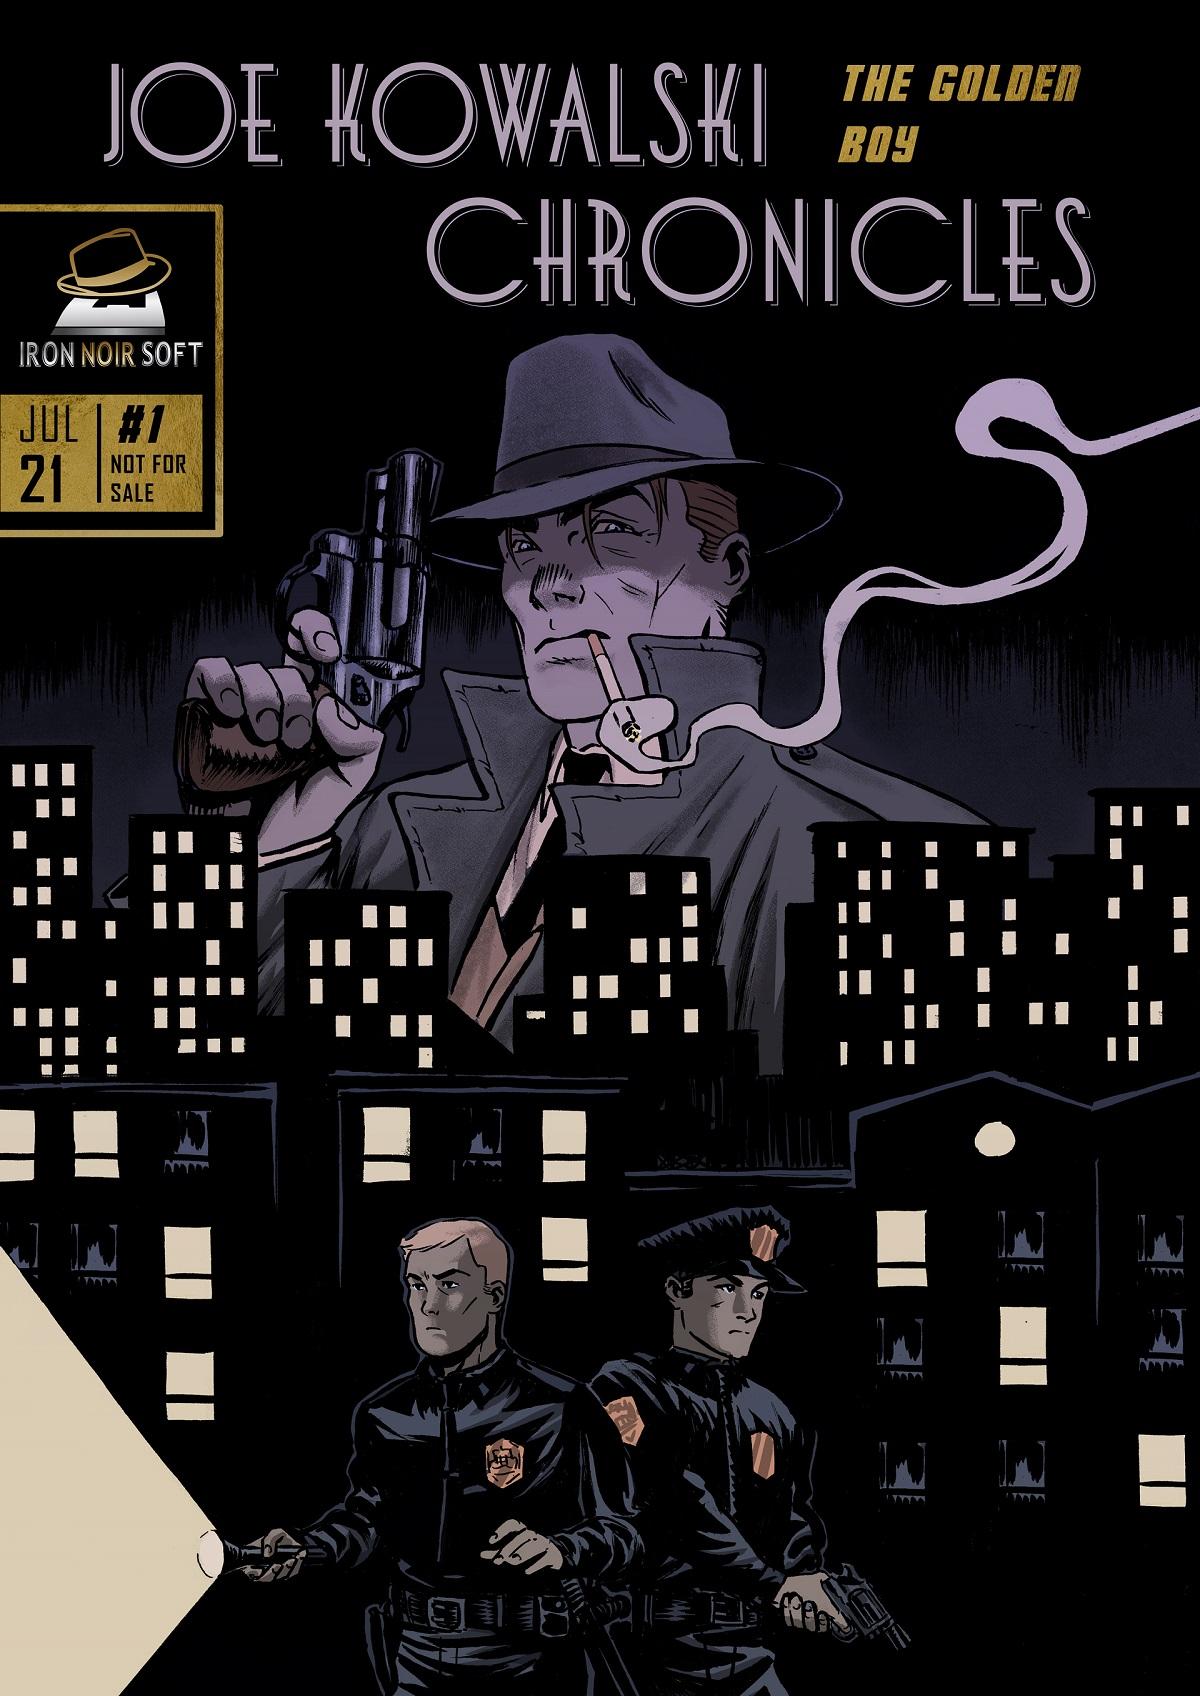 Joe Kowalski Chronicles: The golden boy